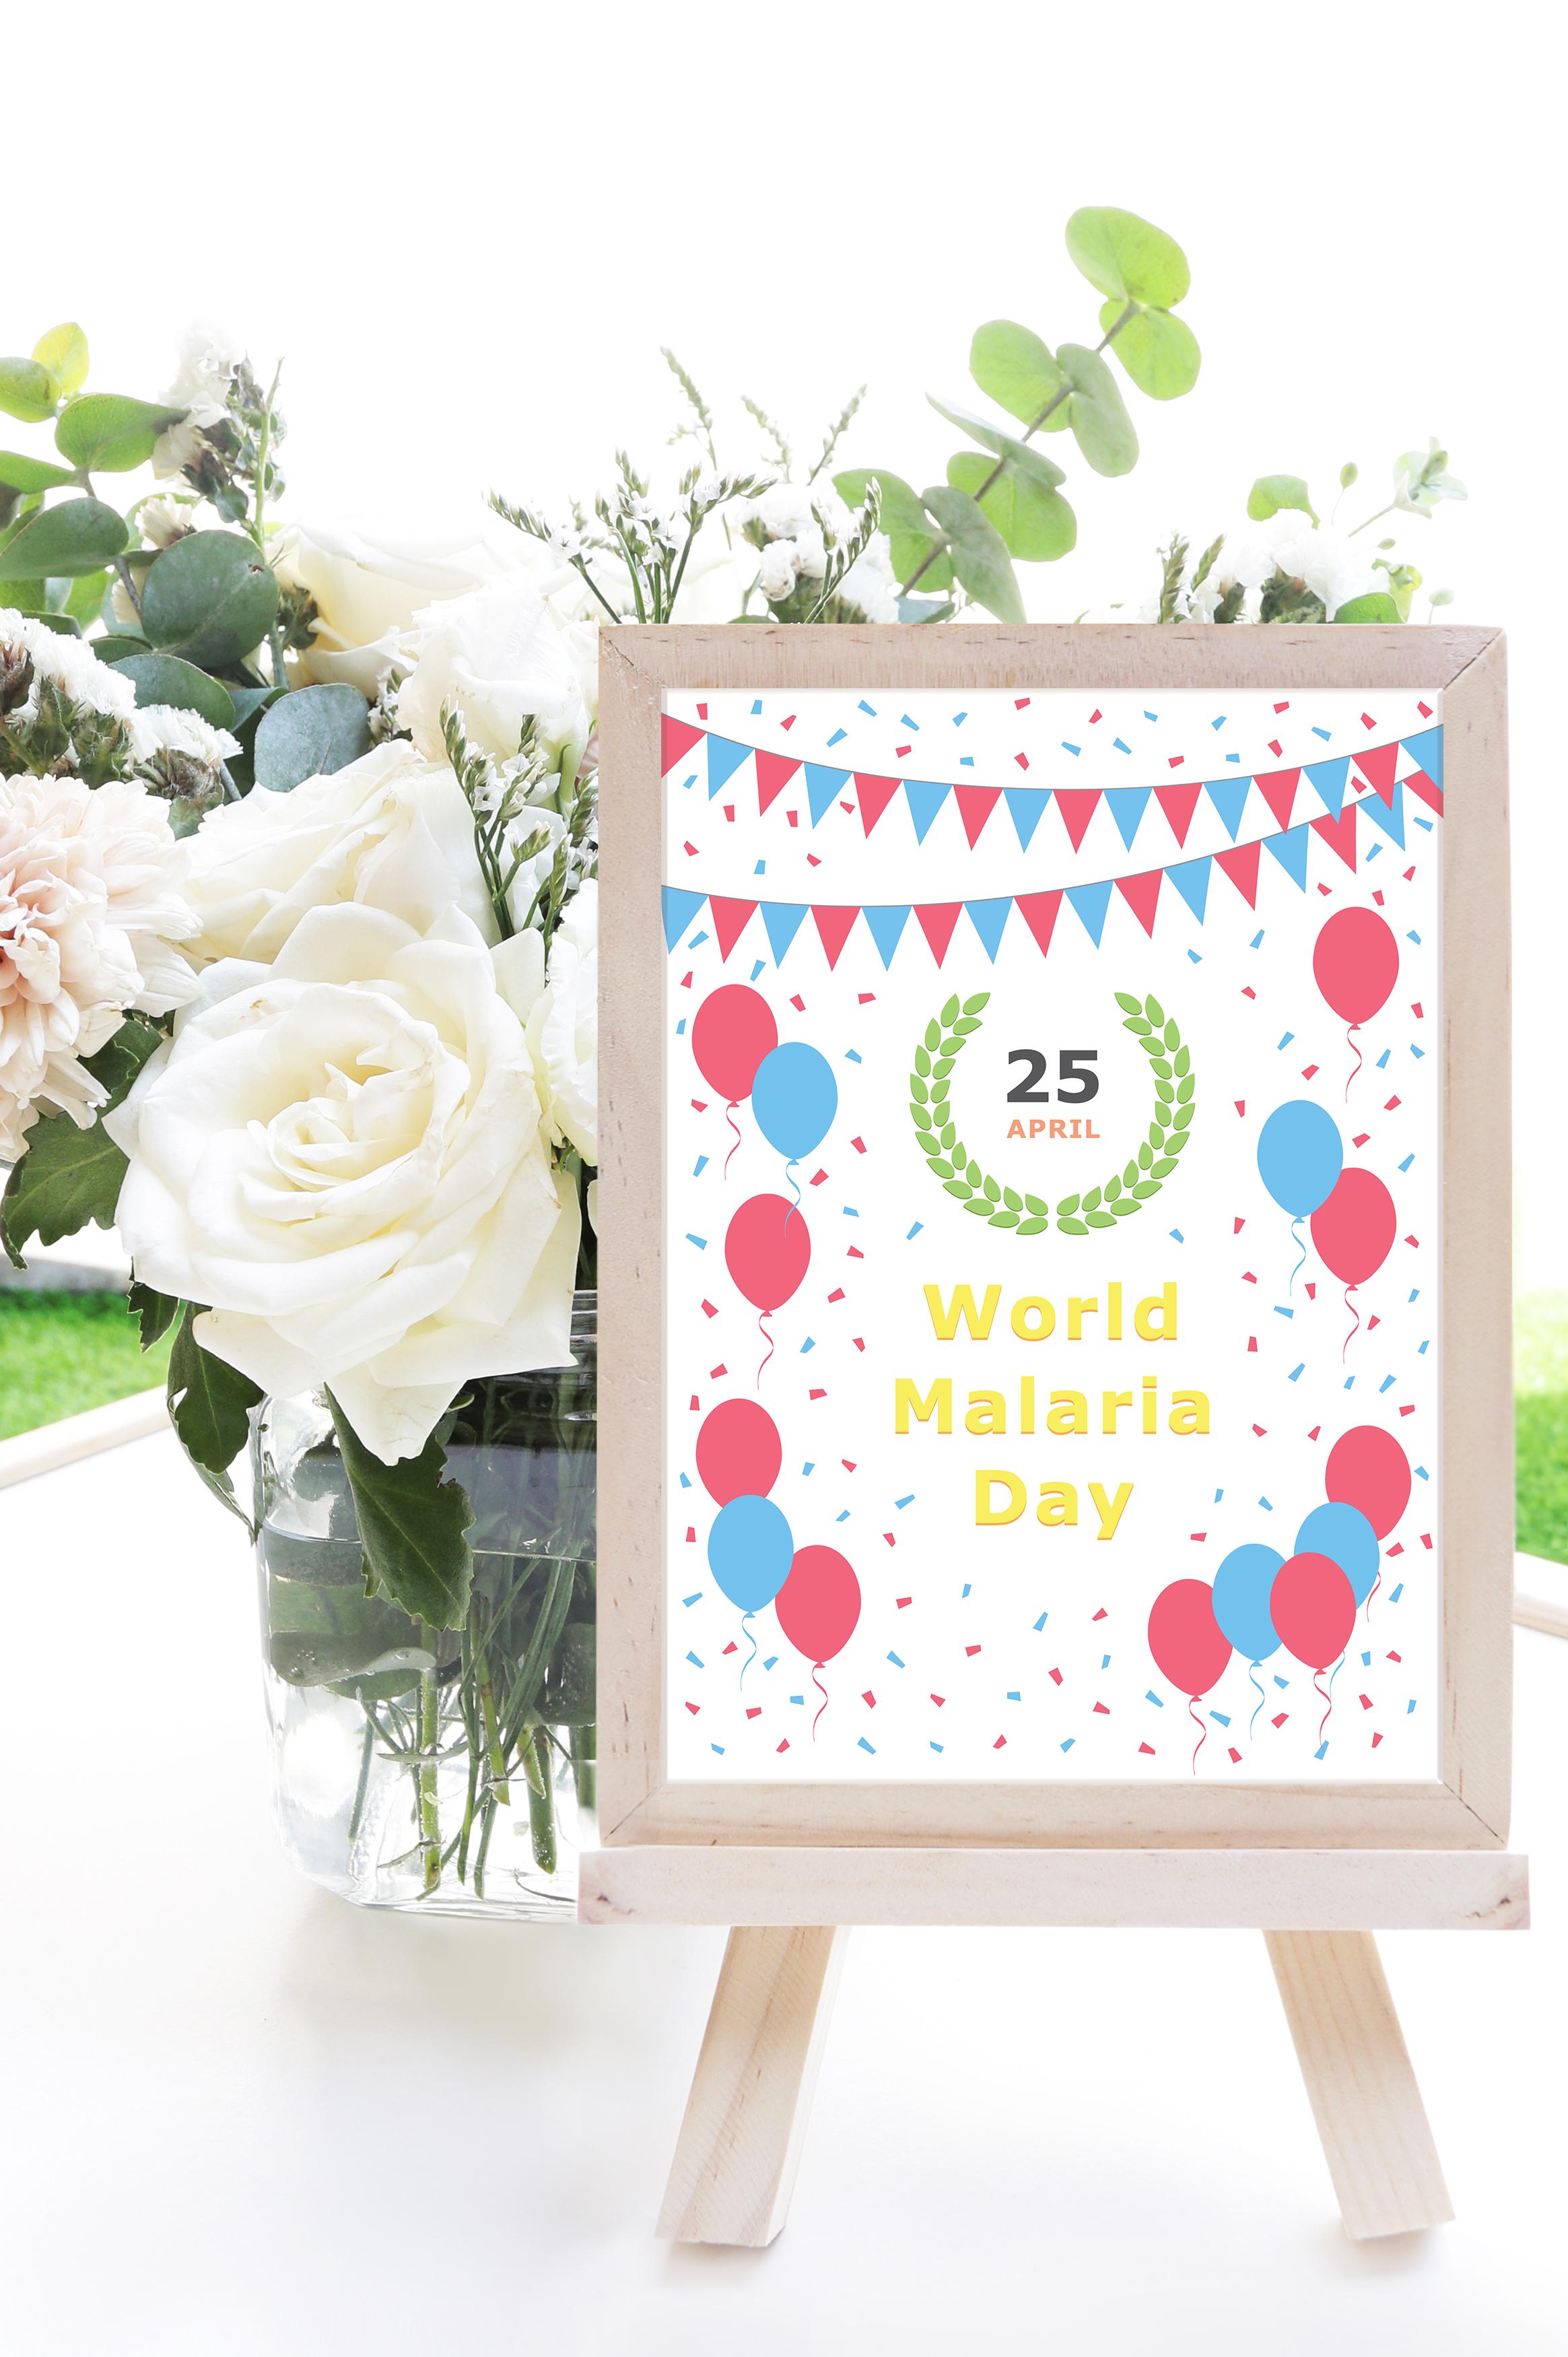 World Malaria Day - April 25 example image 6